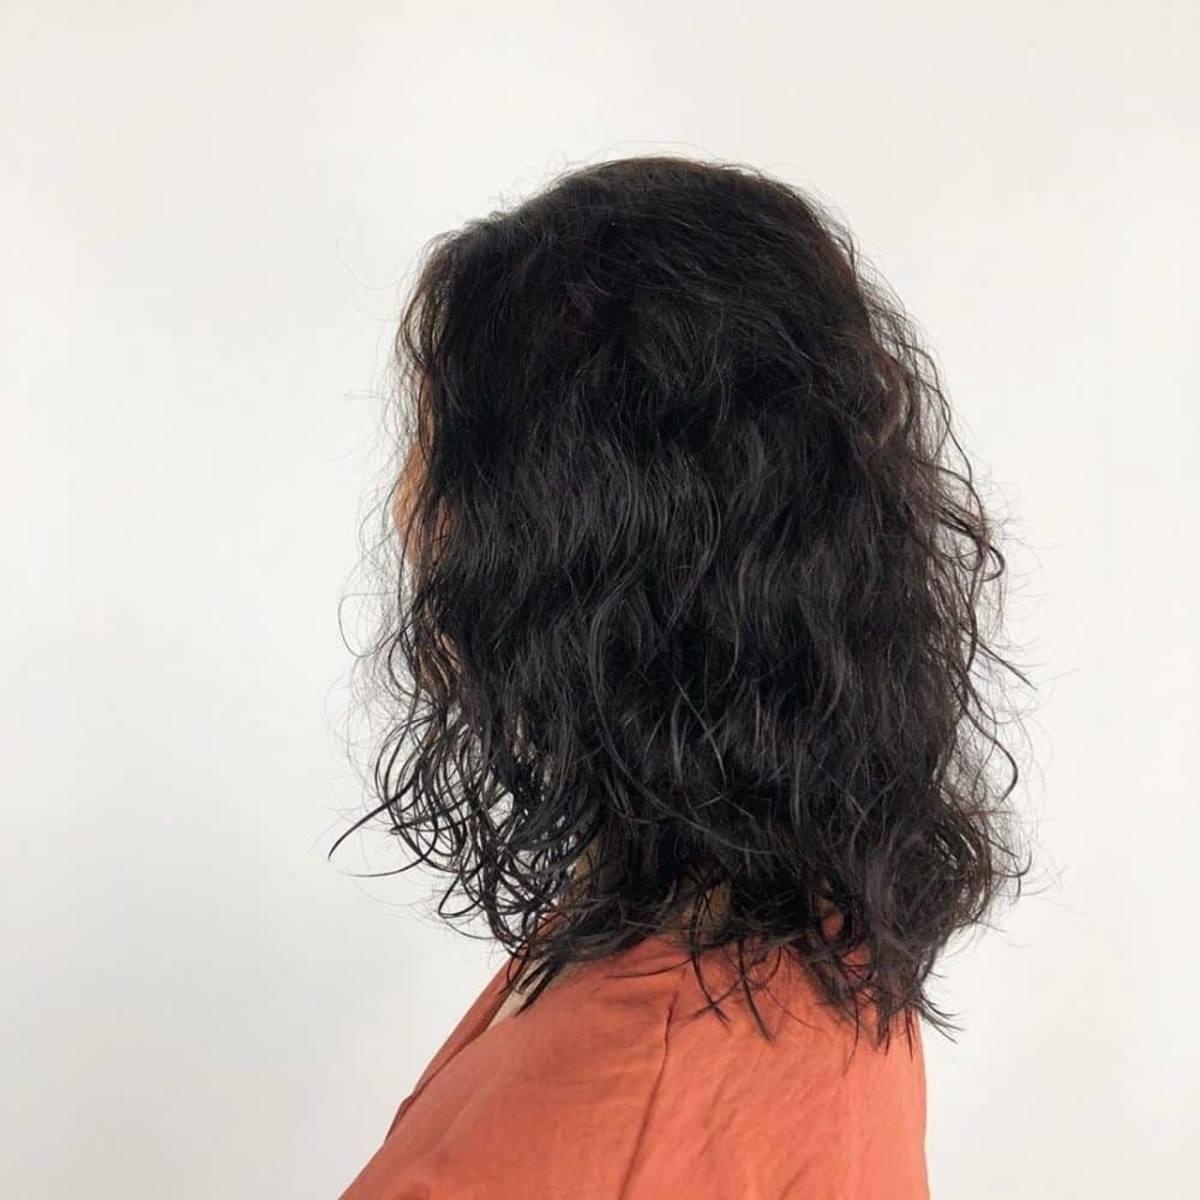 18 Wavy Perm Hairstyle Ideas for a Stylish, Beachy Look